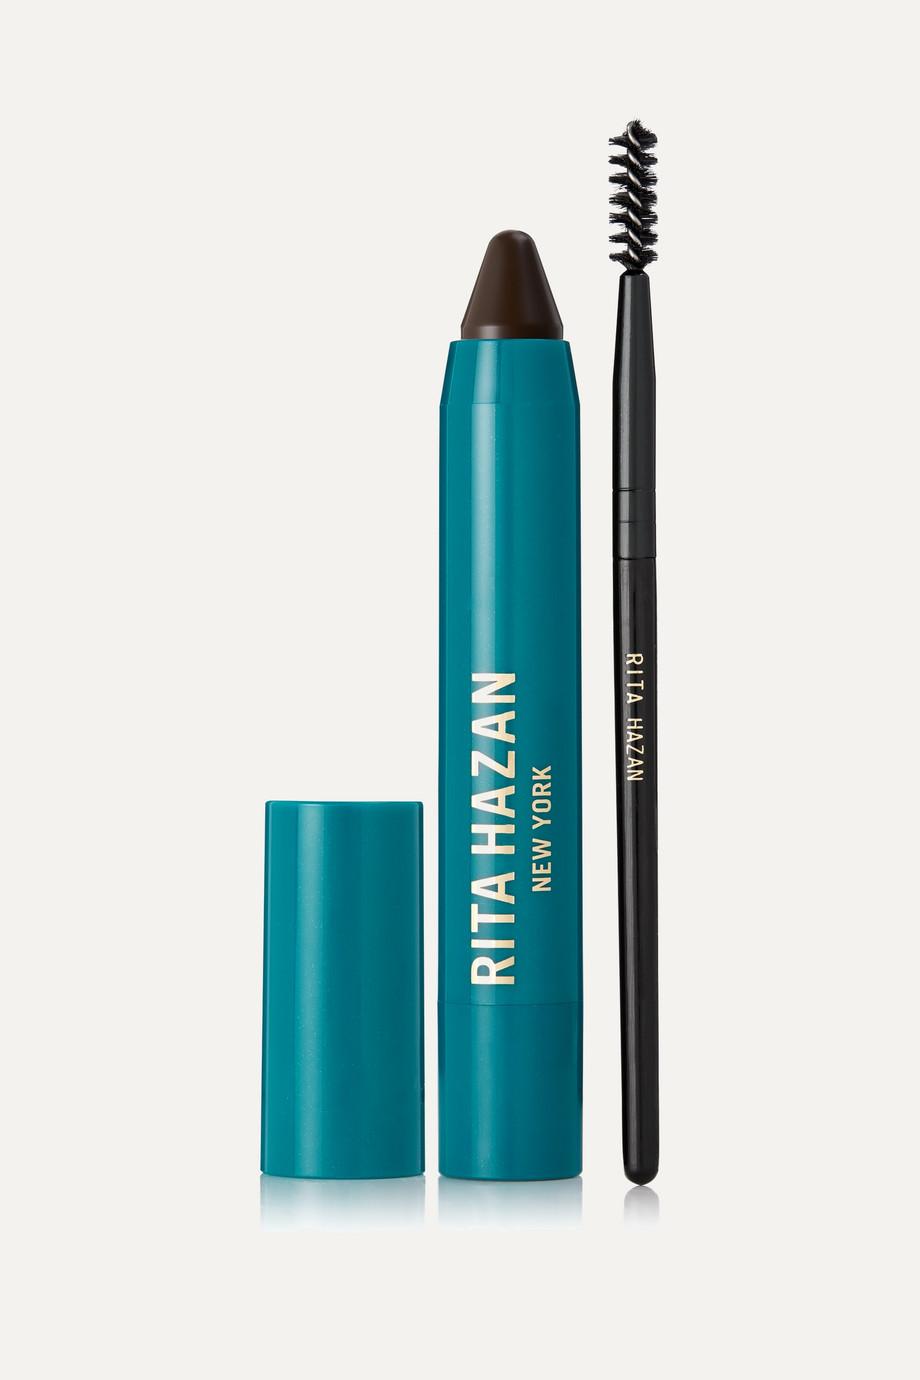 Rita Hazan Root Concealer Touch Up Stick – Light Brown – Ansatzstift